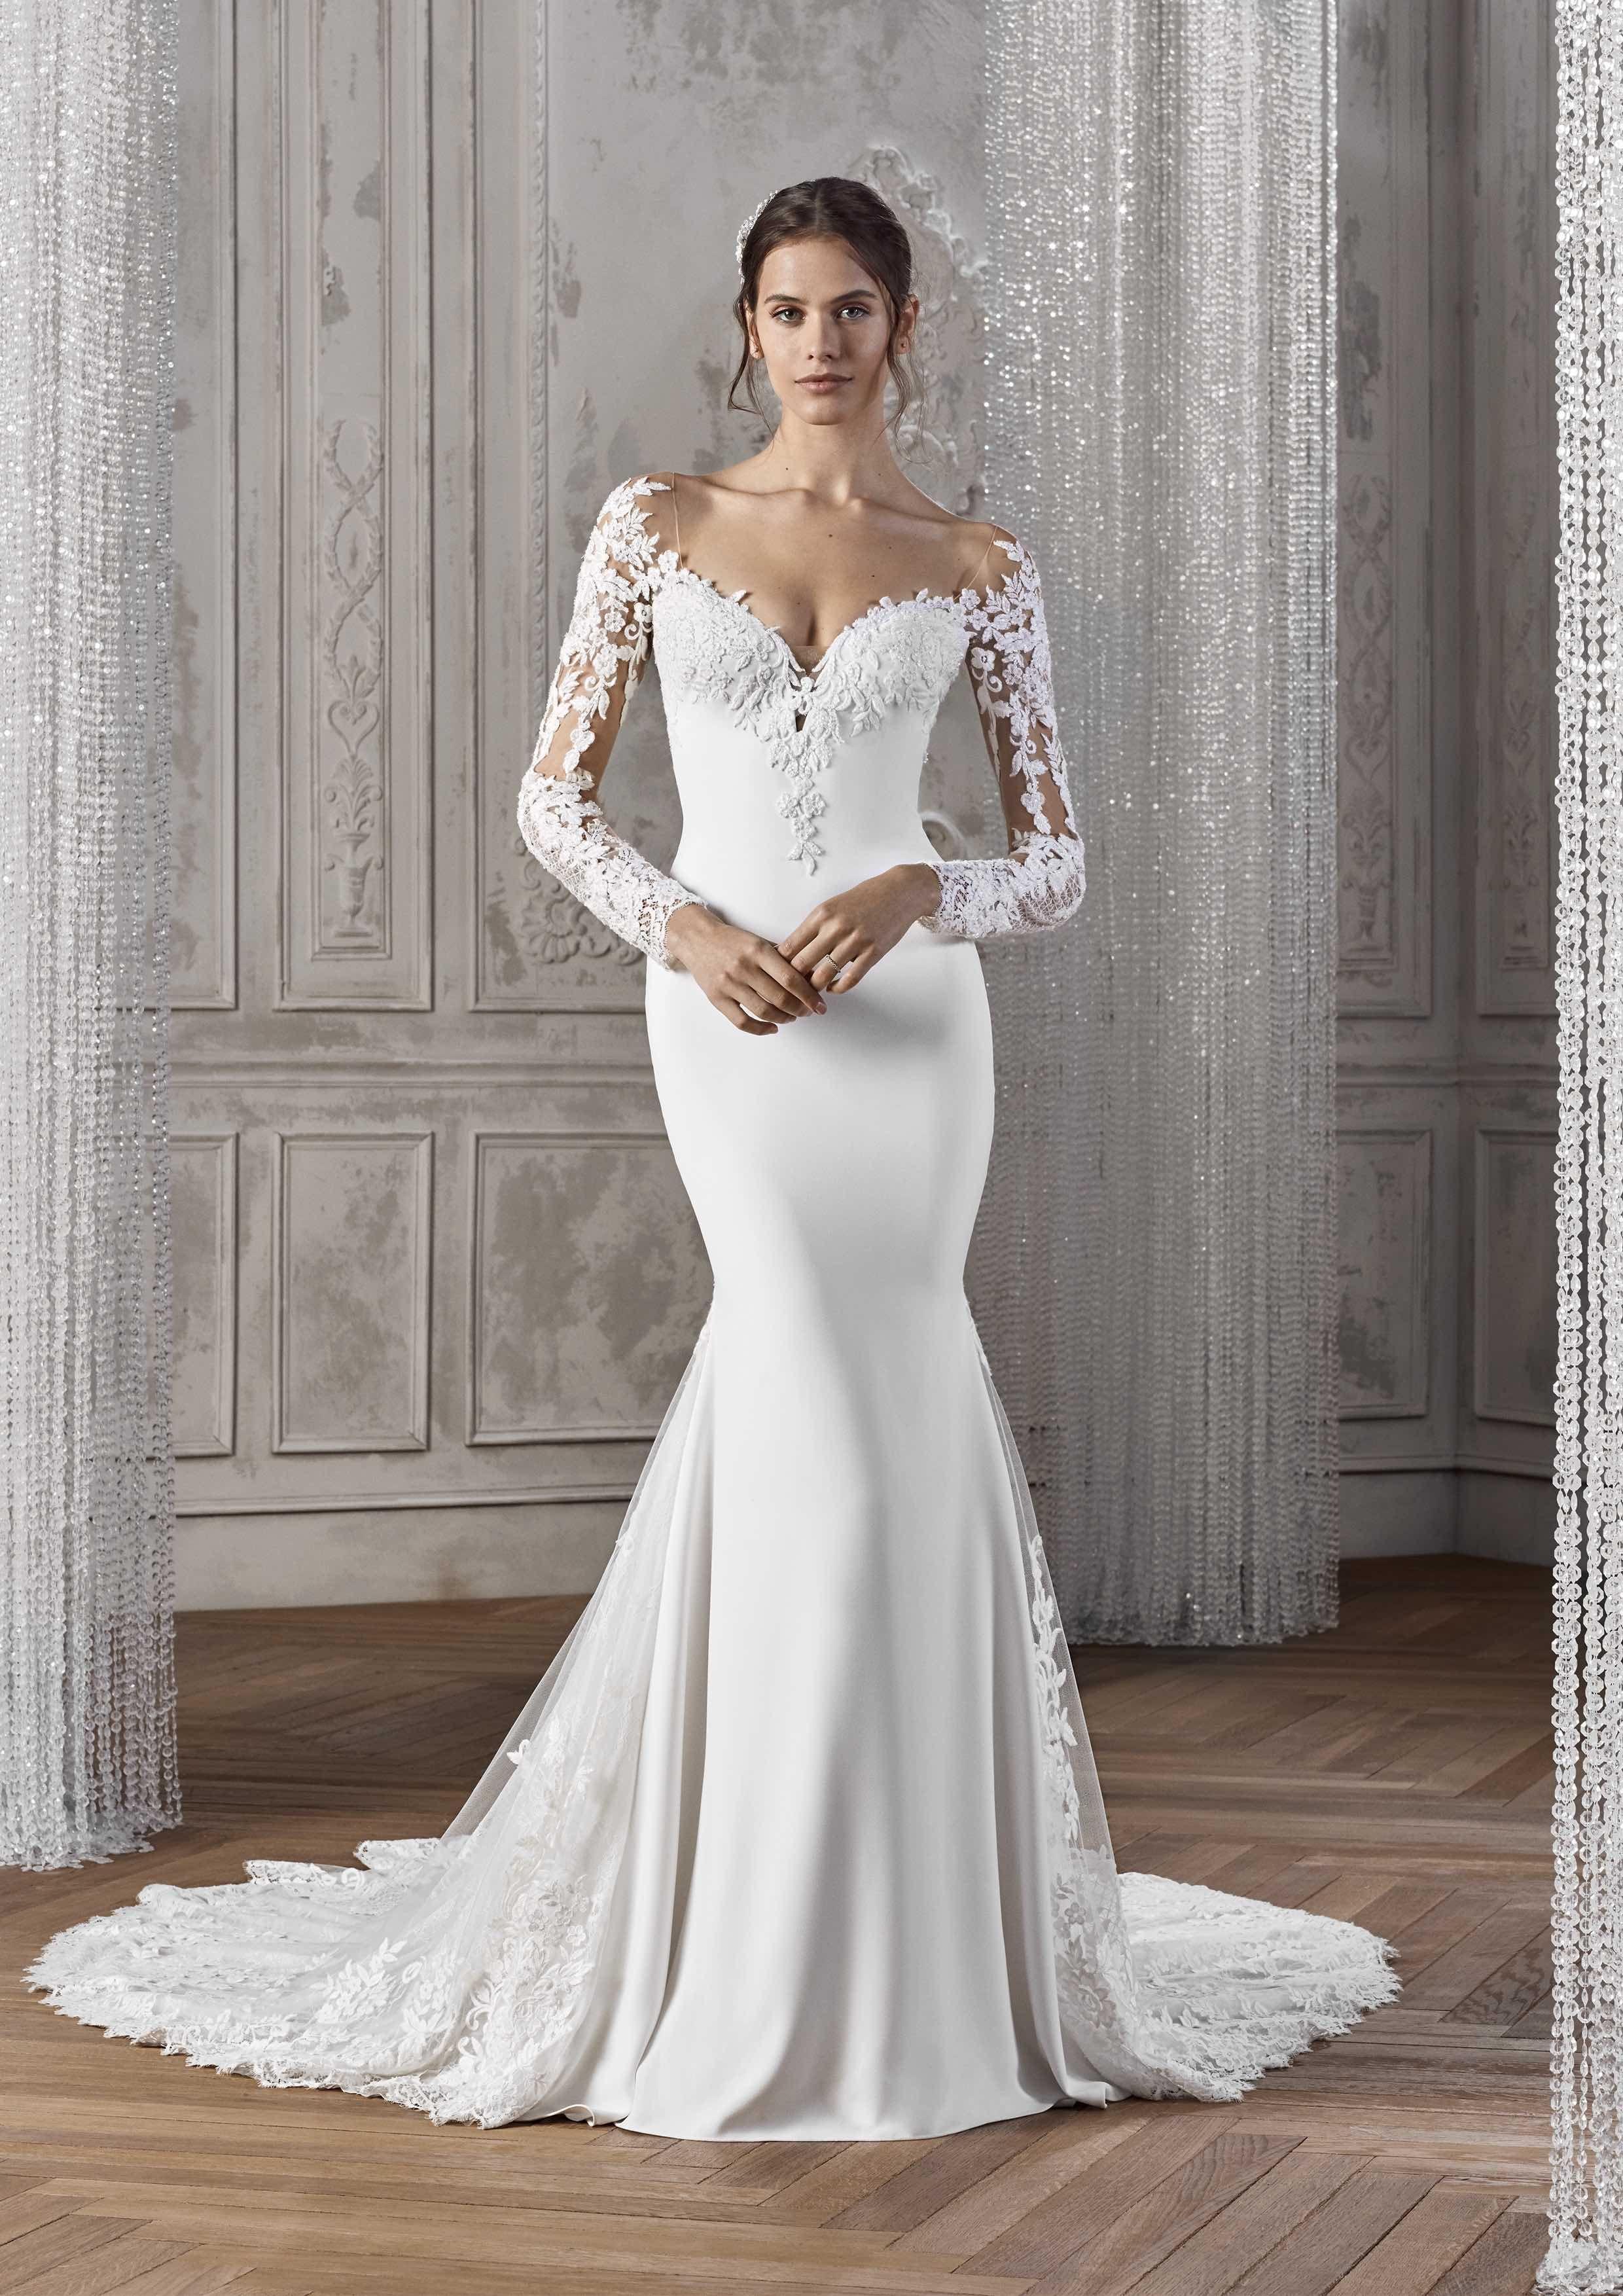 8c60ba6164 KARAH ST PATRICK STUDIO 2019 OFF WHITE WEDDING DRESS LUV BRIDAL AUSTRALIA